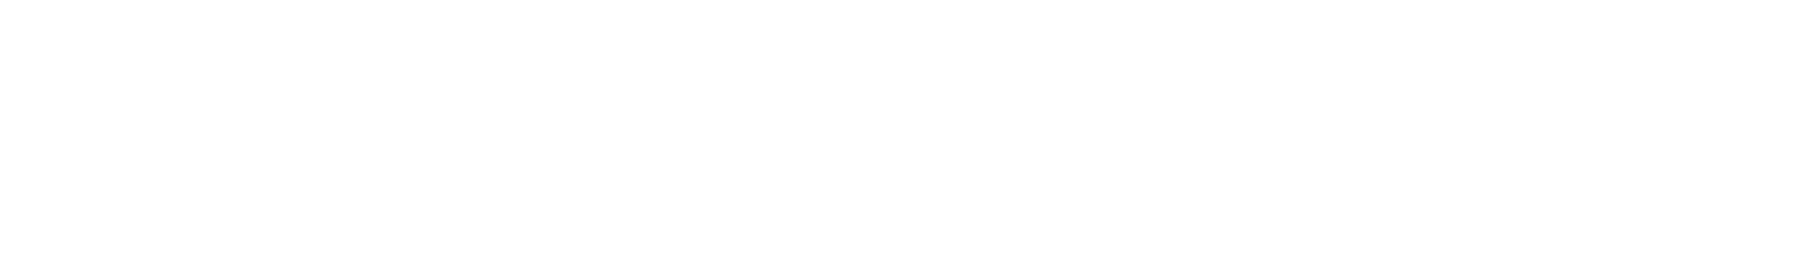 320738 dub techno synt 5 wav